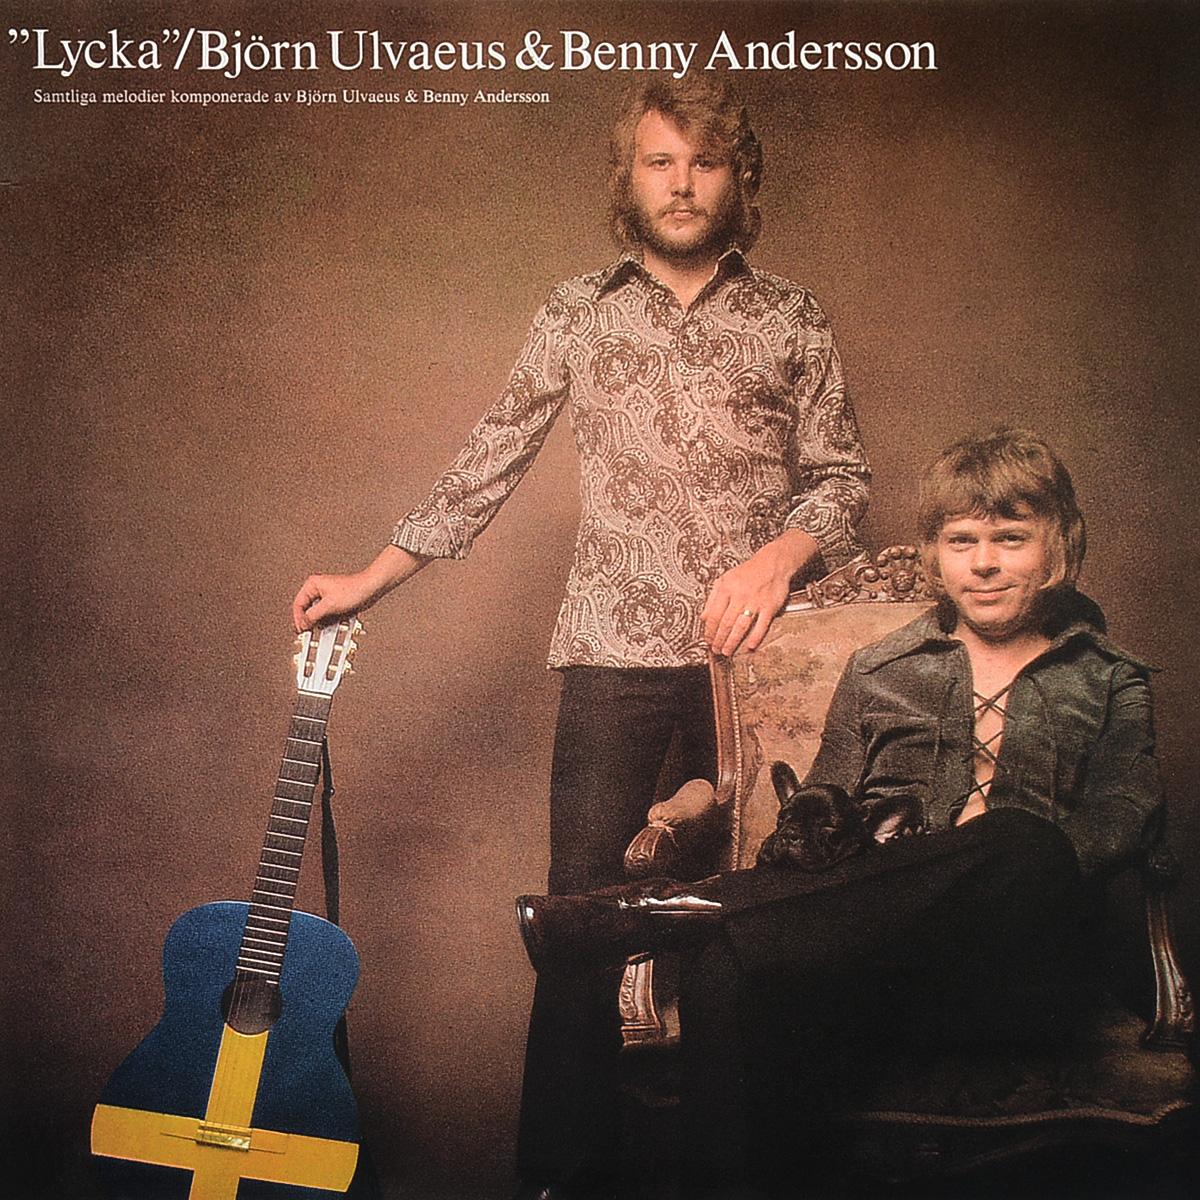 Бенни Андерссон Benny Andersson, Bjorn Ulvaeus. Lycka (LP) бенни бенасси grand collection benny benassi